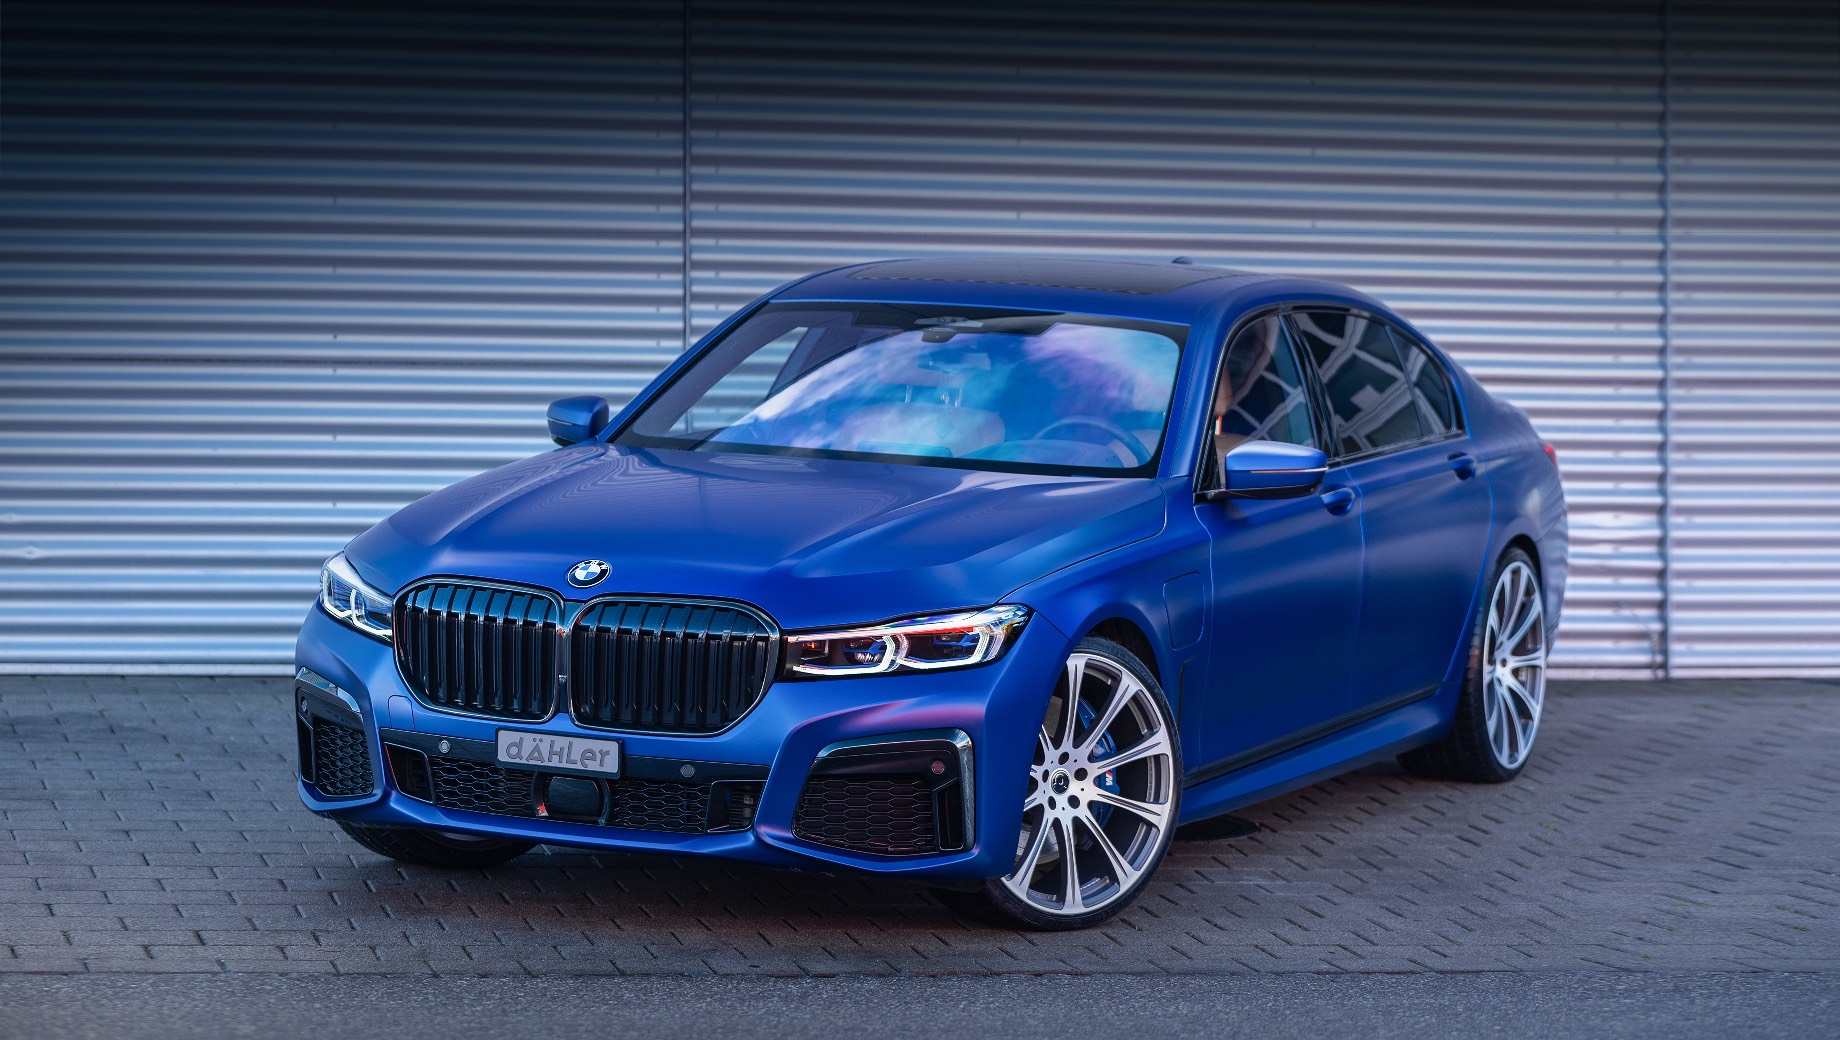 Бюро dÄHLer зарядило гибрид BMW 745Le xDrive